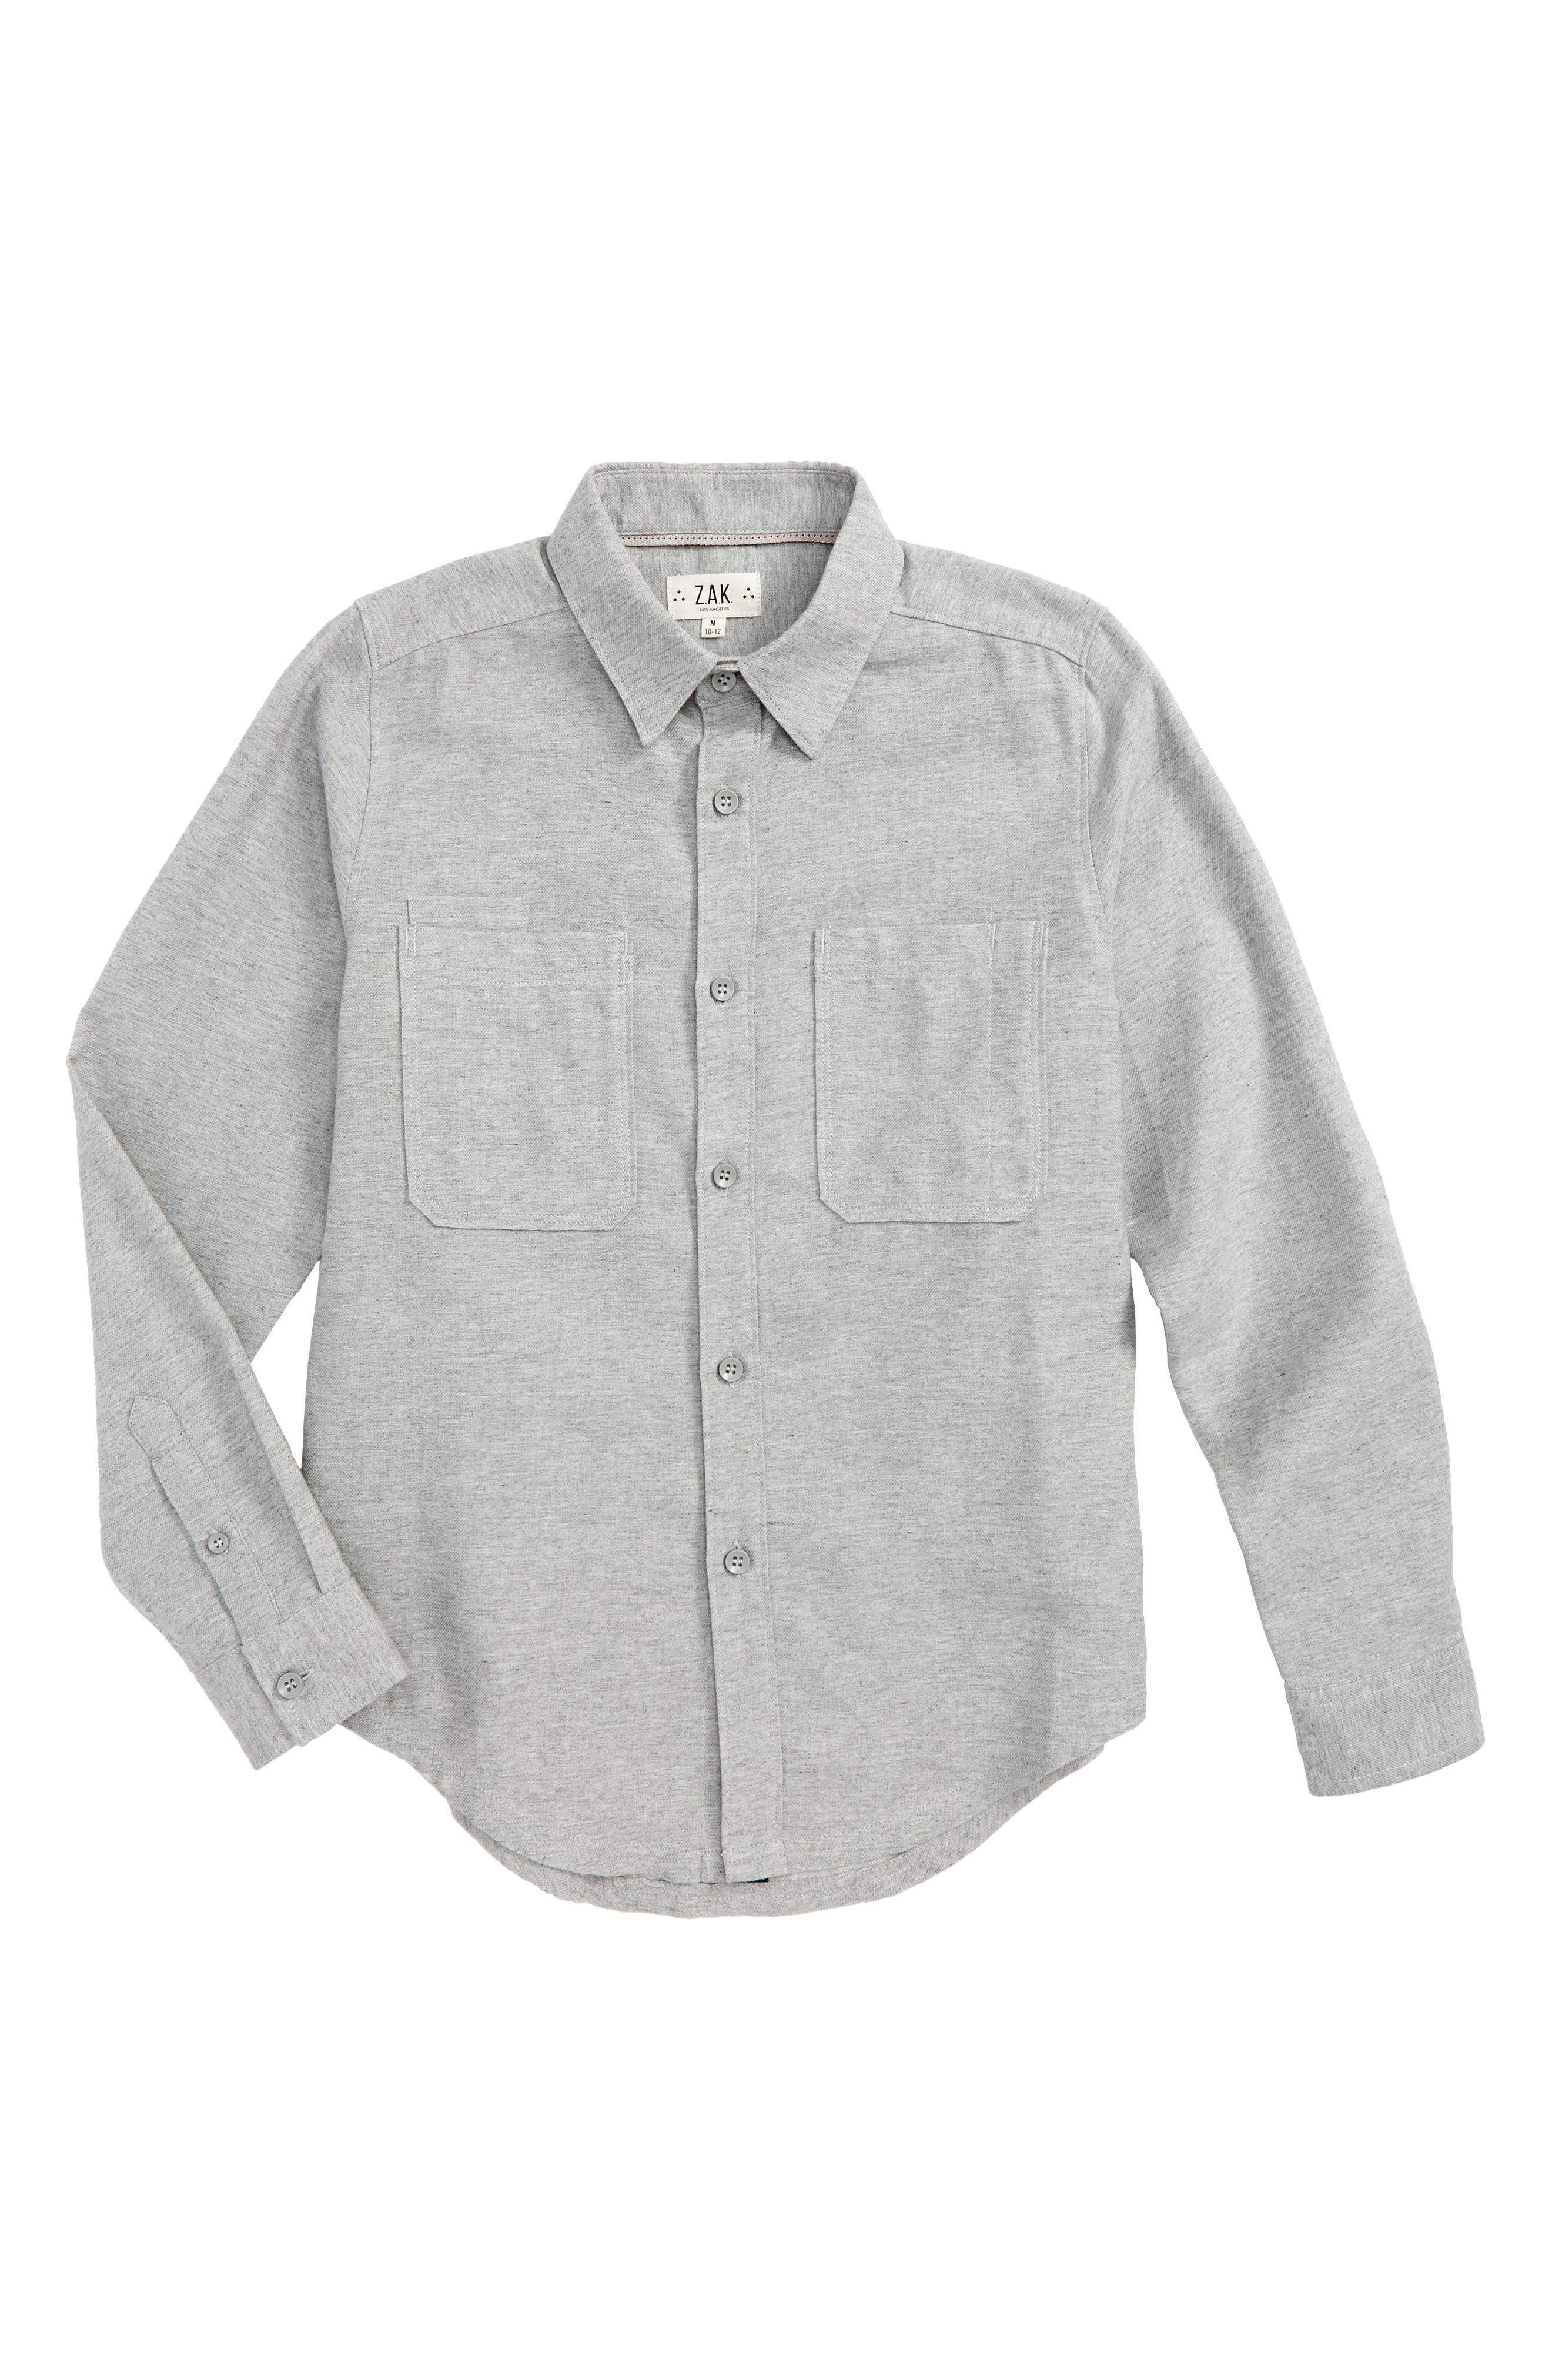 Woven Flannel Shirt,                             Main thumbnail 1, color,                             021